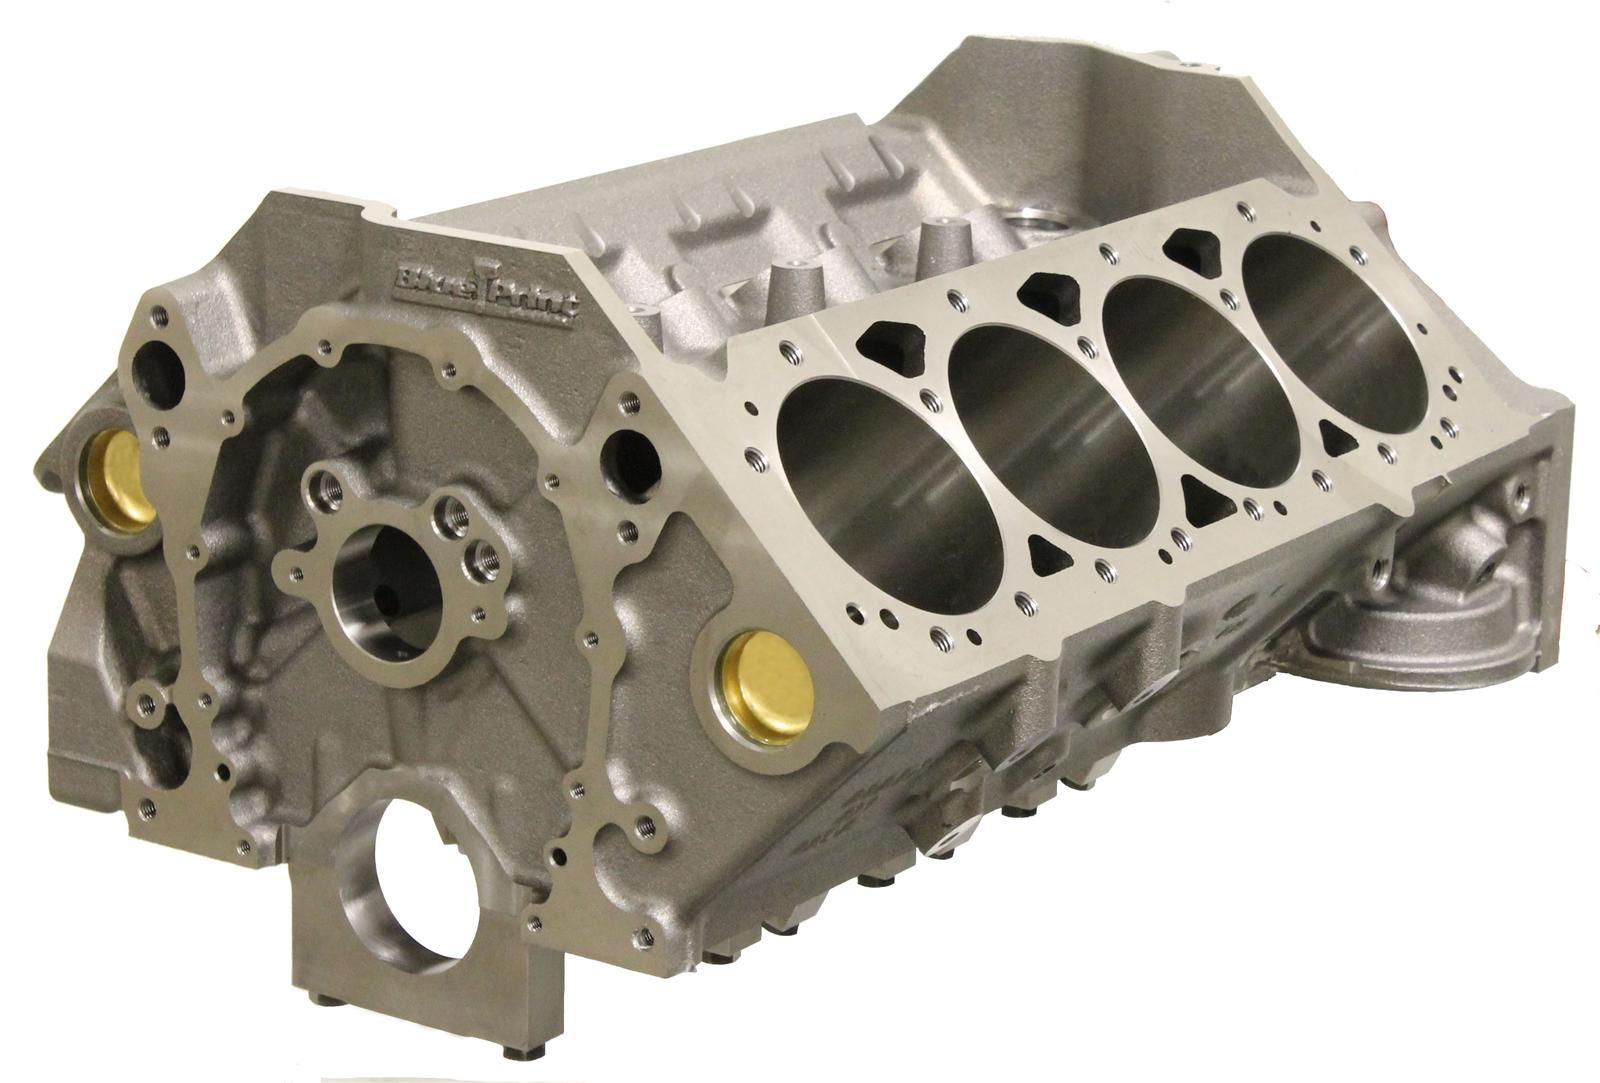 Blueprint engines chevrolet 350400 engine block bpsb4000200w ebay blueprint engines chevrolet 350400 engine block bpsb4000200w malvernweather Image collections